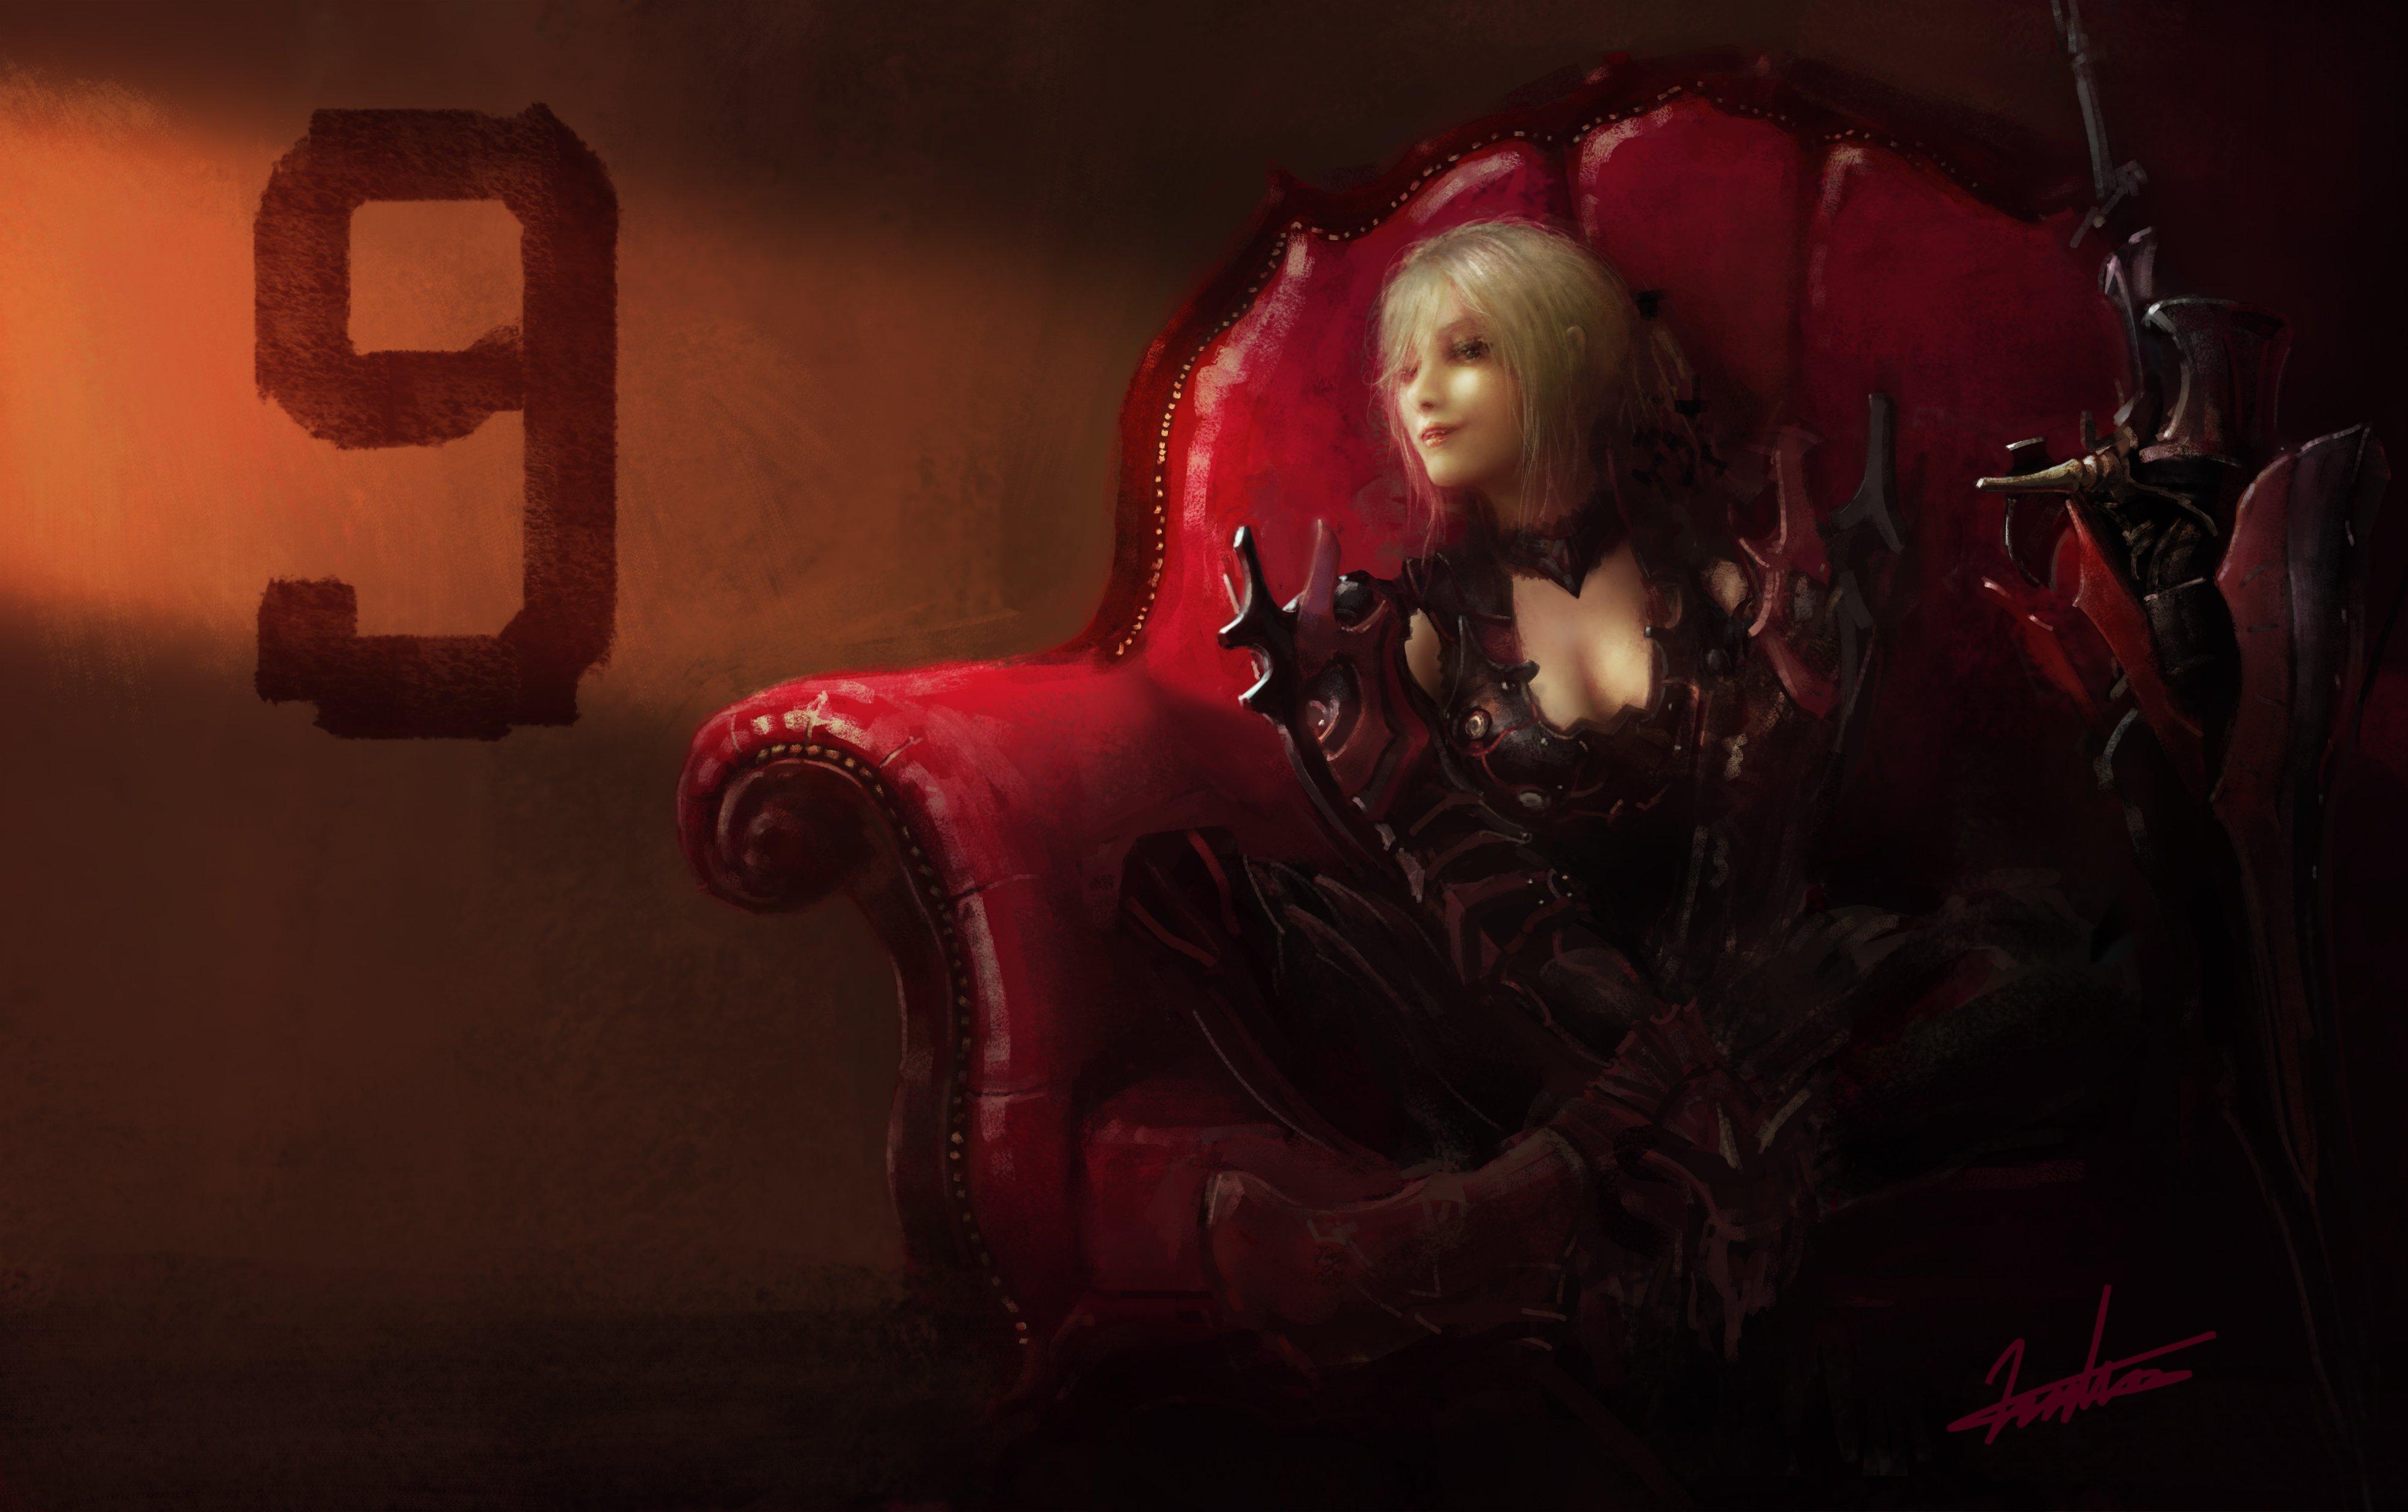 2048x1152 aranea highwind final fantasy xv artwork 2048x1152